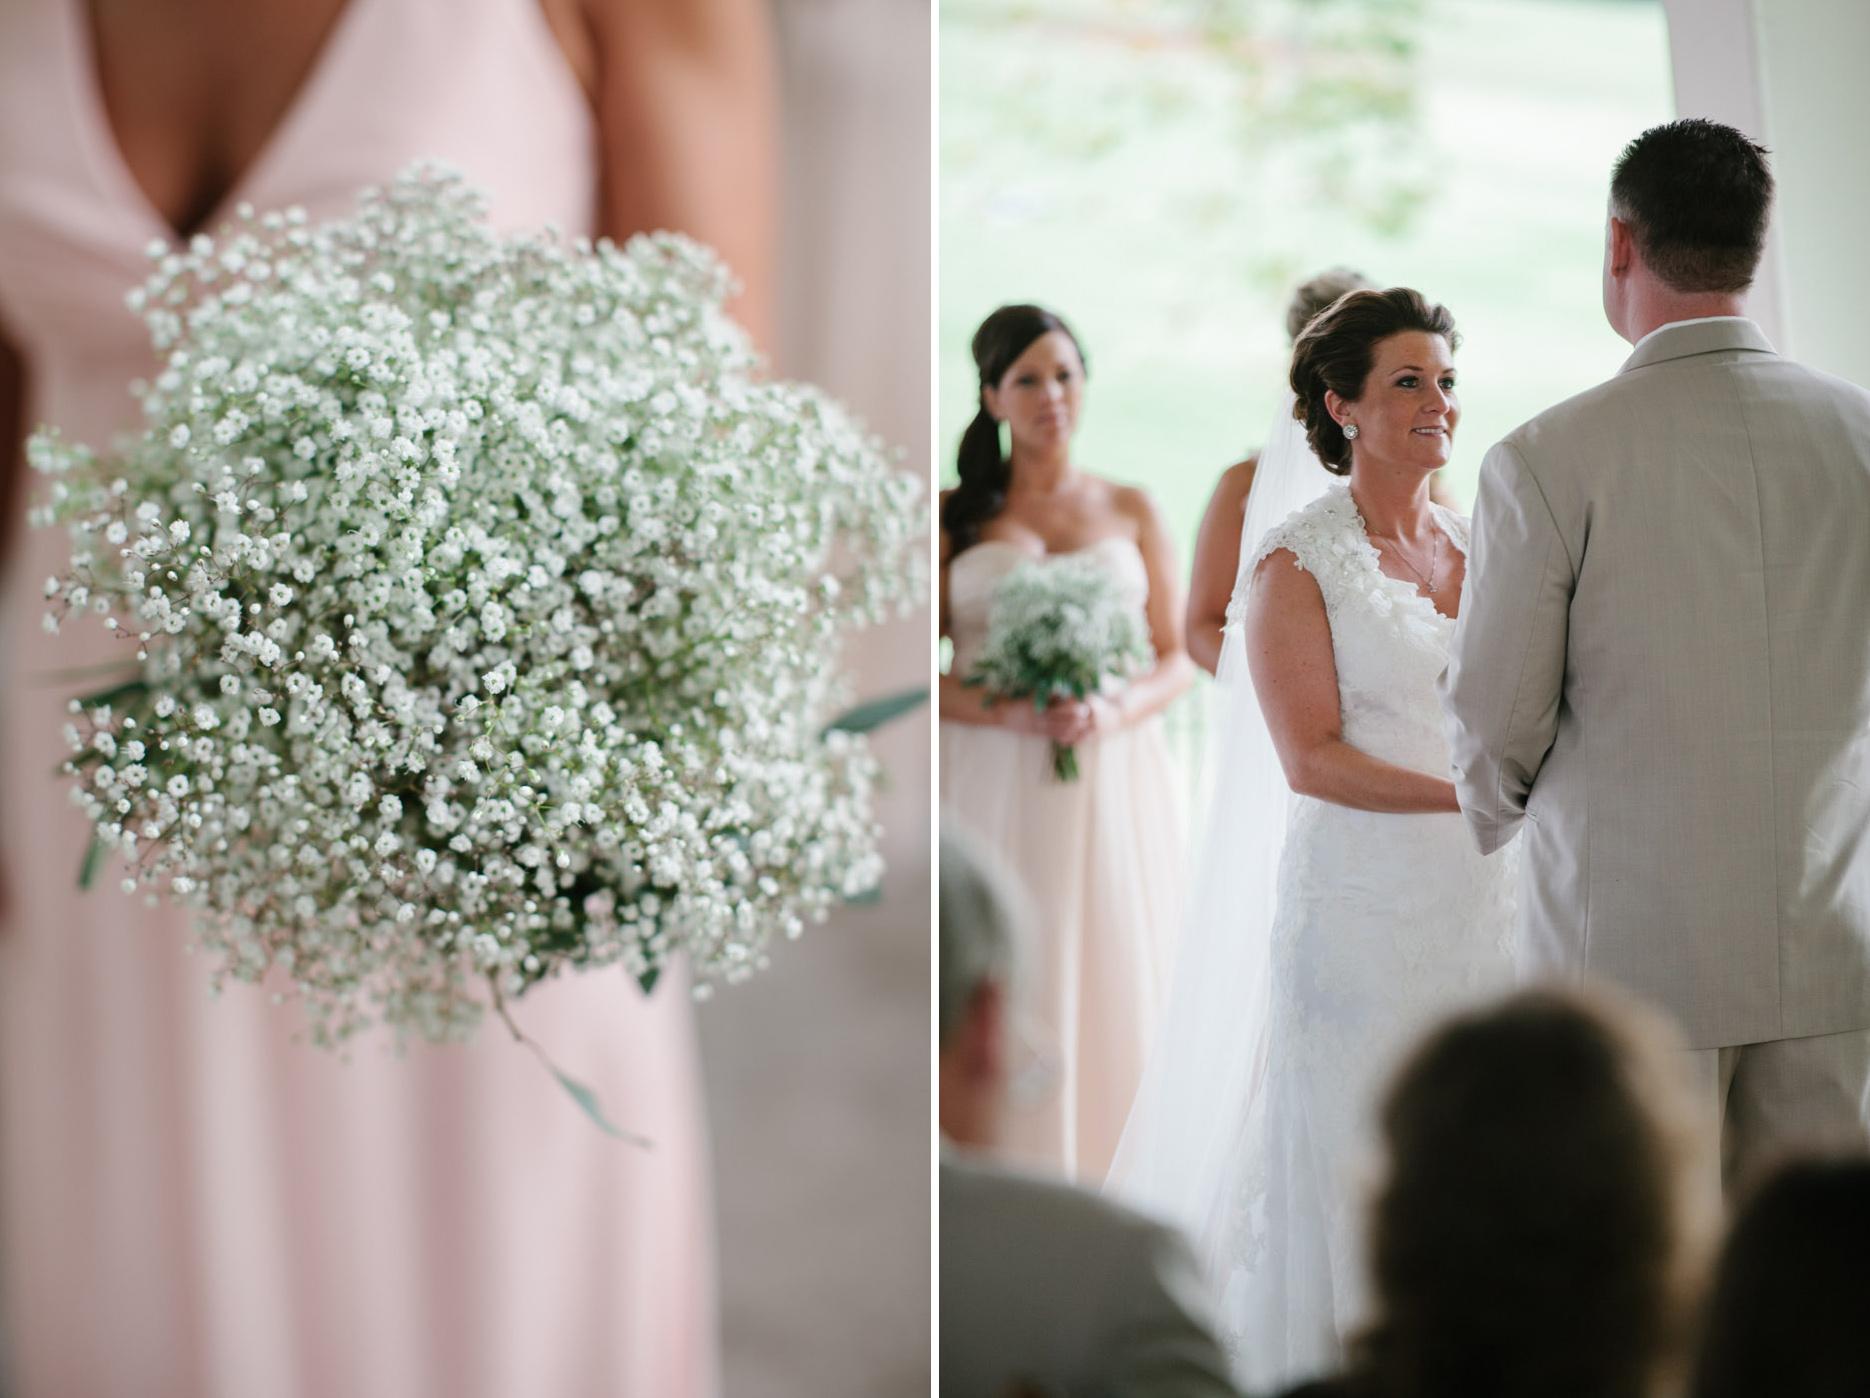 St-Louis-Wedding-Photography-1034-copy.jpg